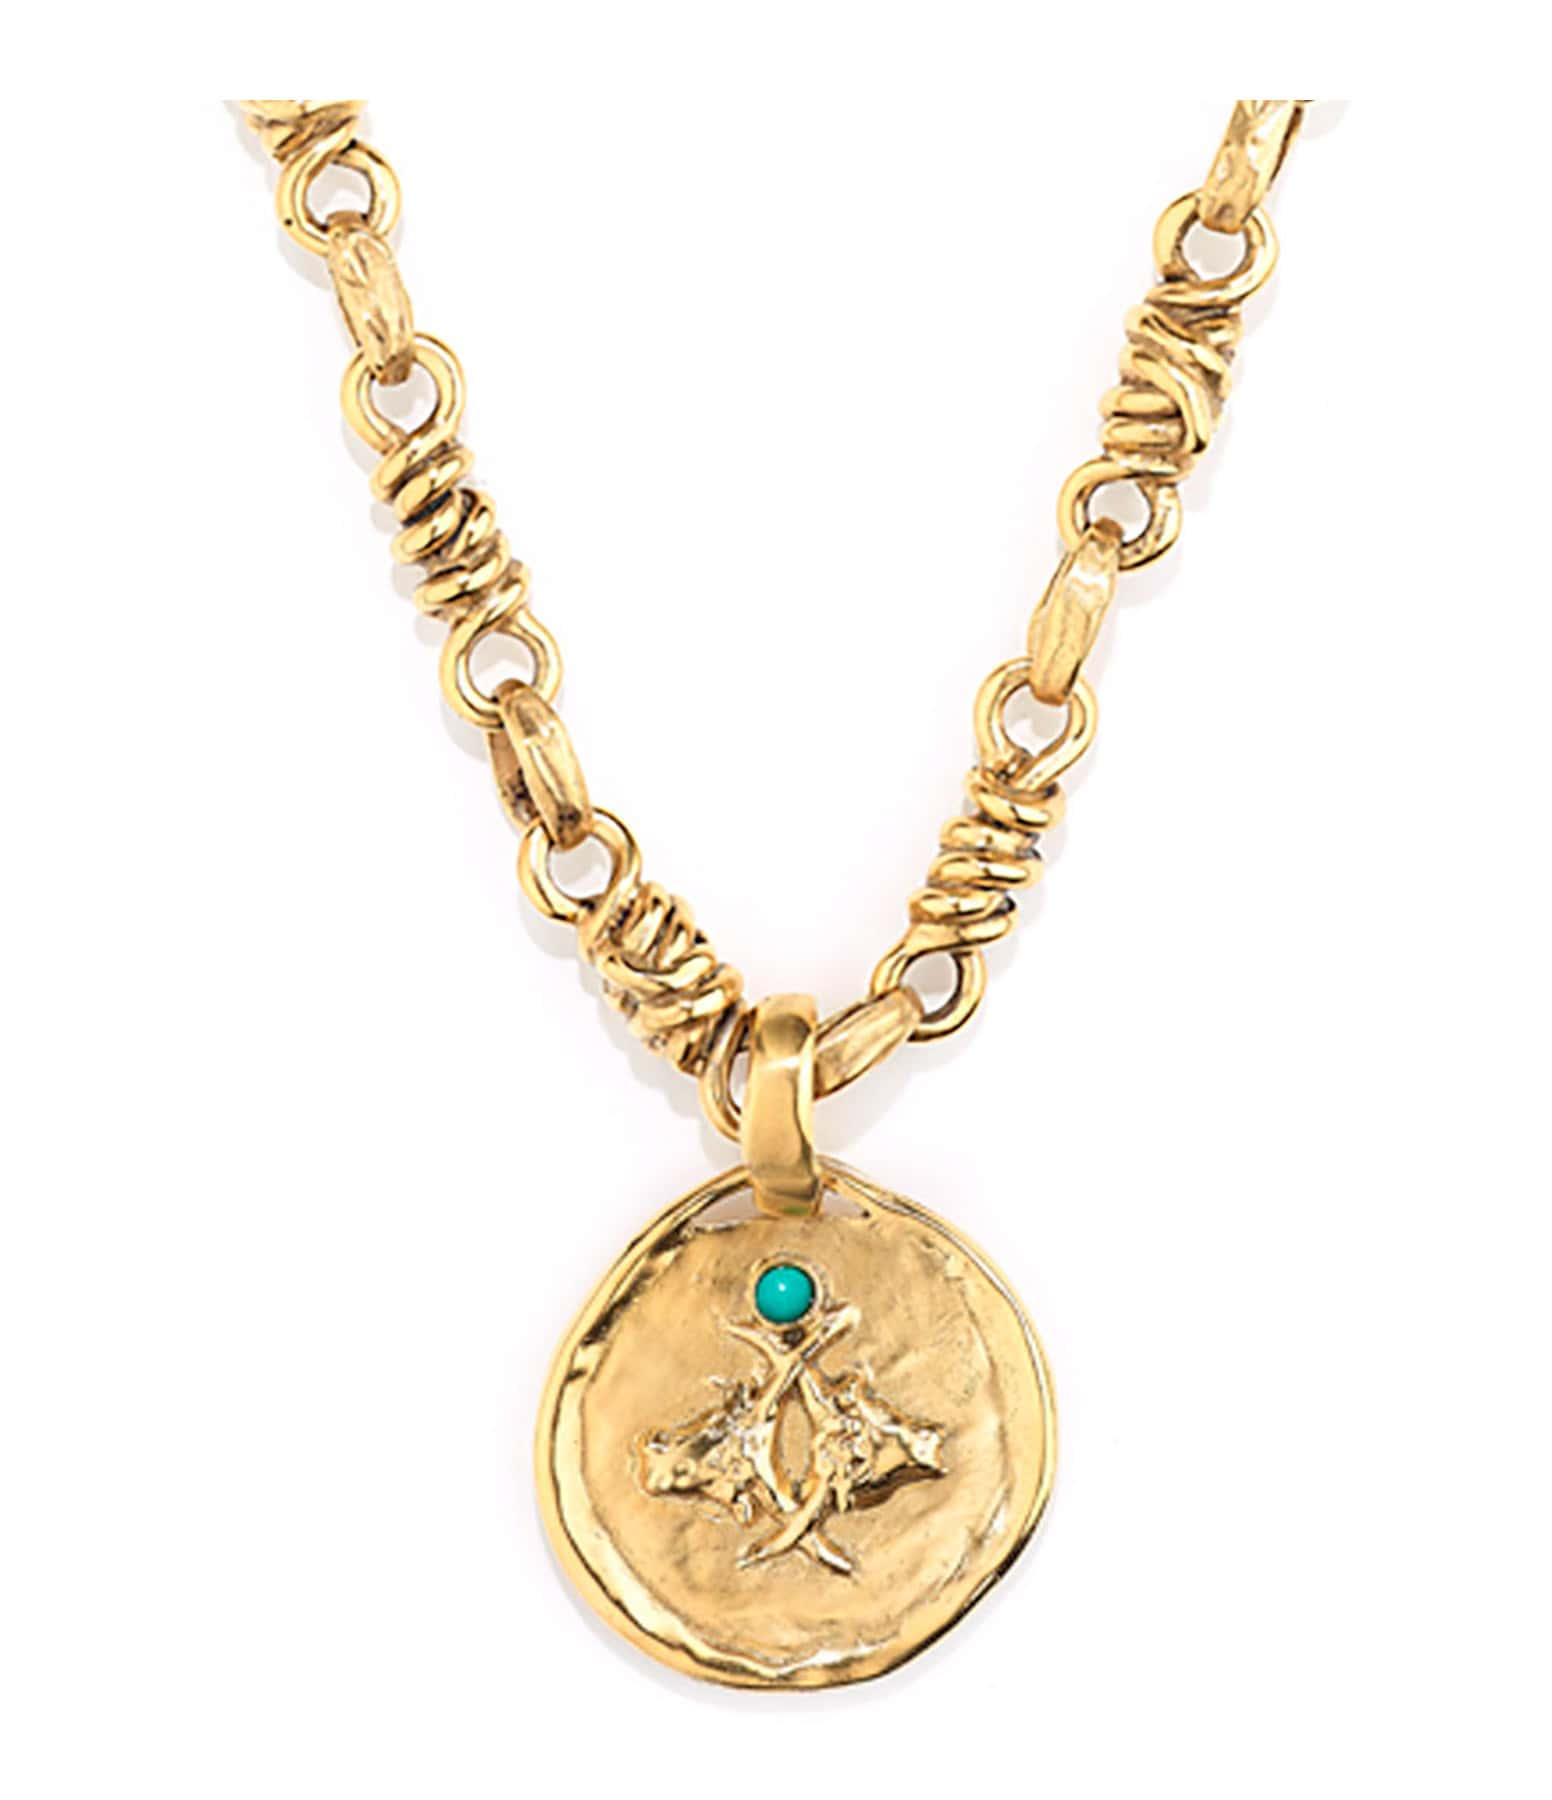 GOOSSENS - Collier Talisman Astro Taureau Turquoise